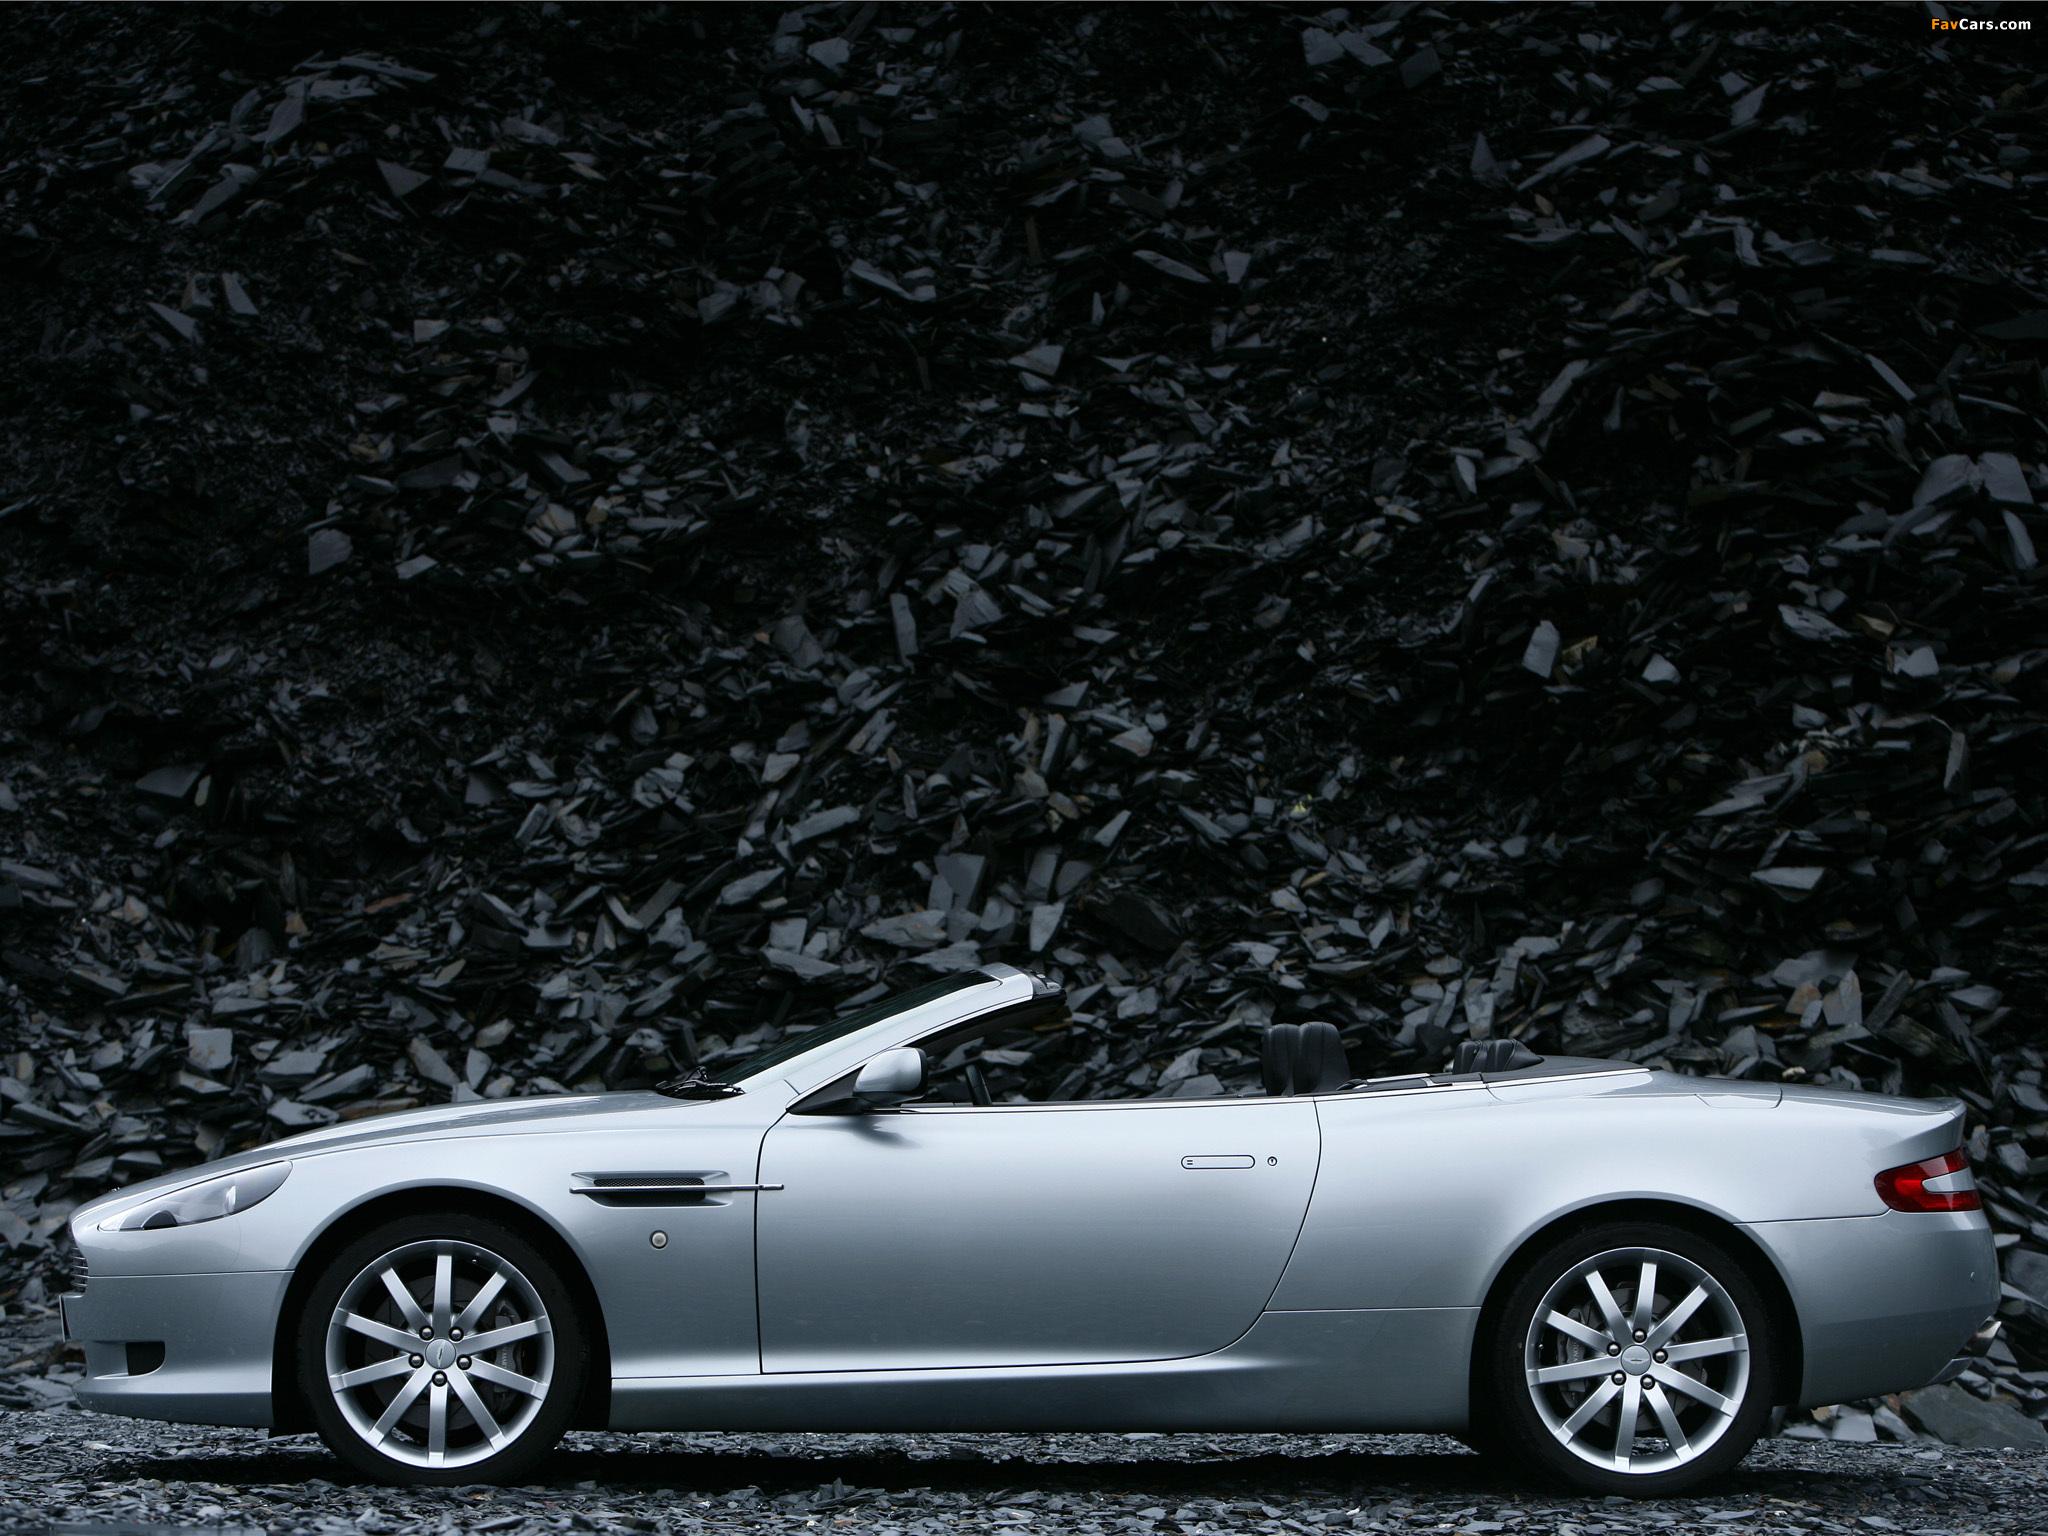 Aston Martin DB9 Volante (2004–2008) Pictures (2048x1536